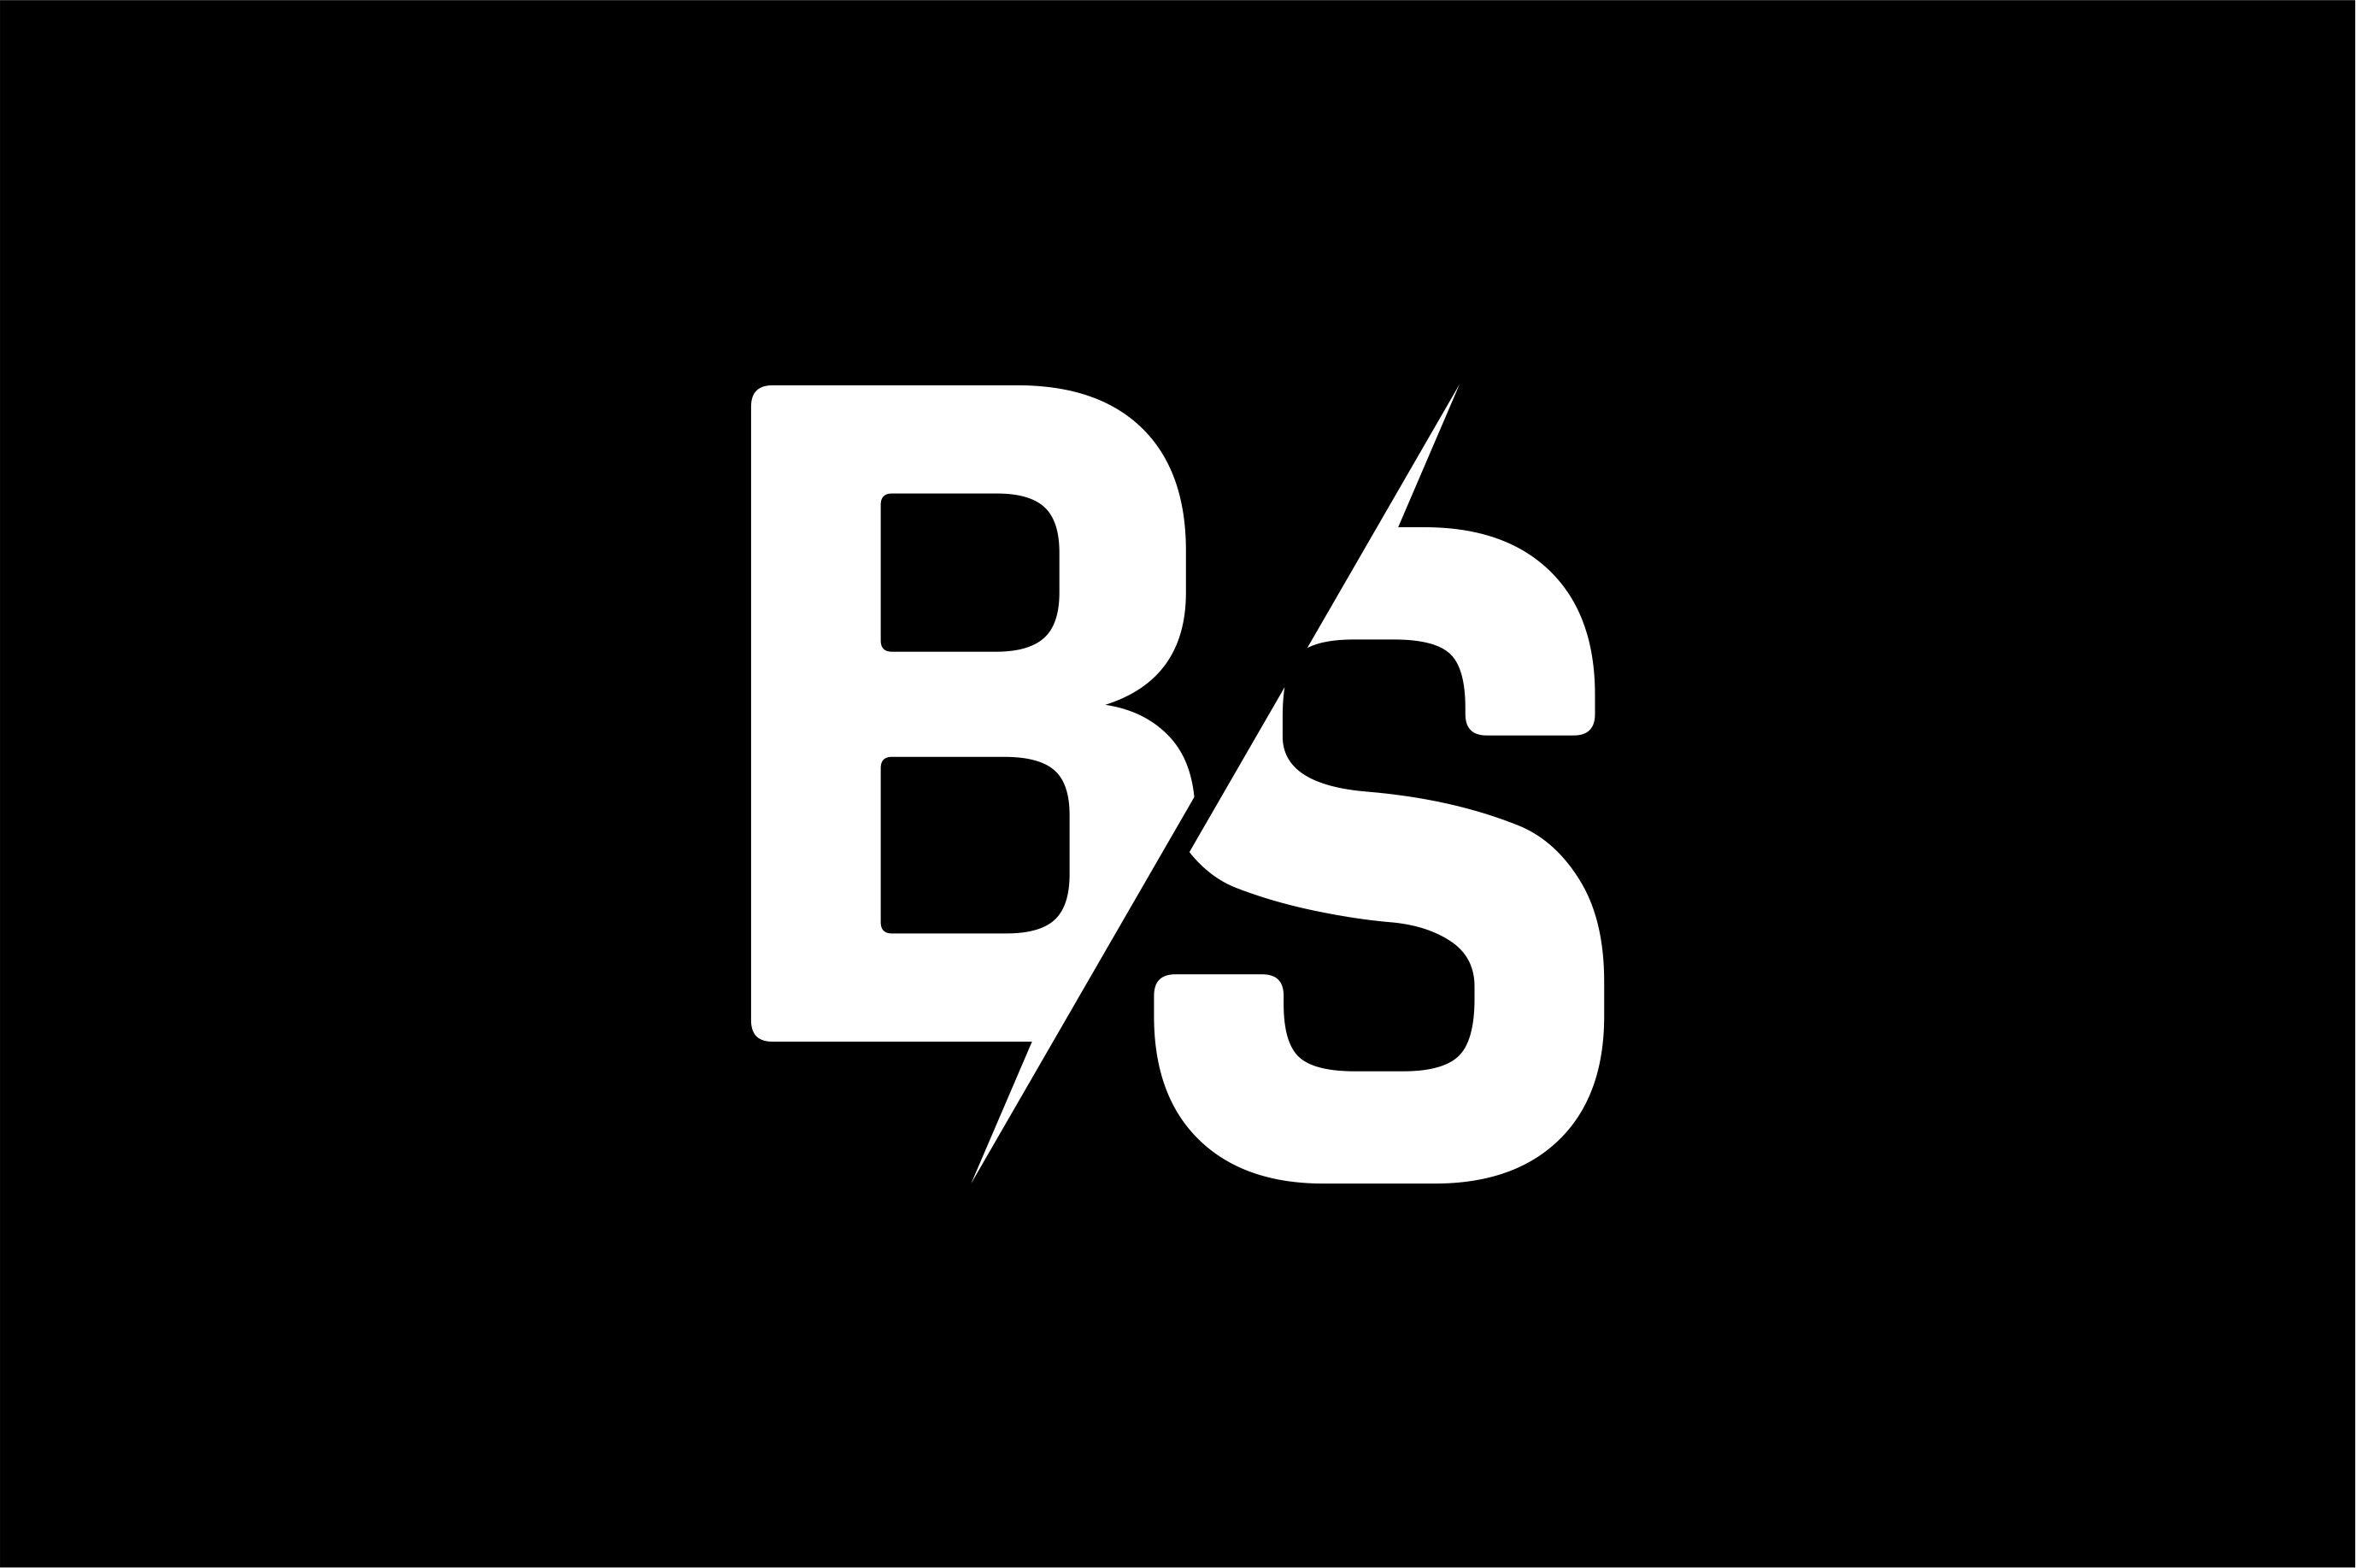 Monogram Bs Logo Graphic By Greenlines Studios Creative Fabrica